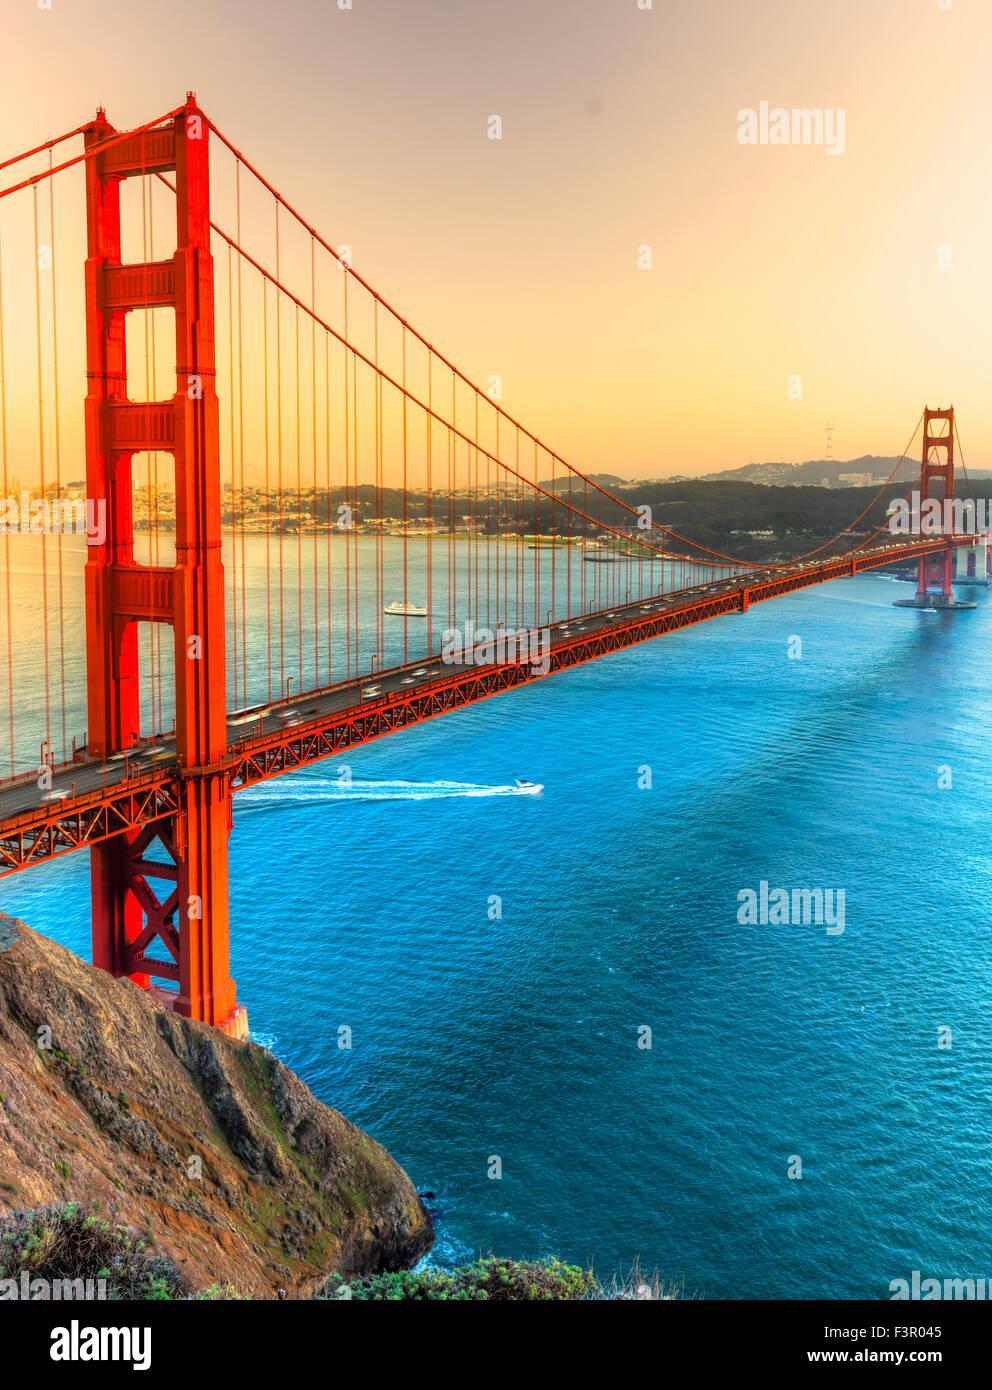 Puente Golden Gate, San Francisco, California, EEUU. Imagen De Stock